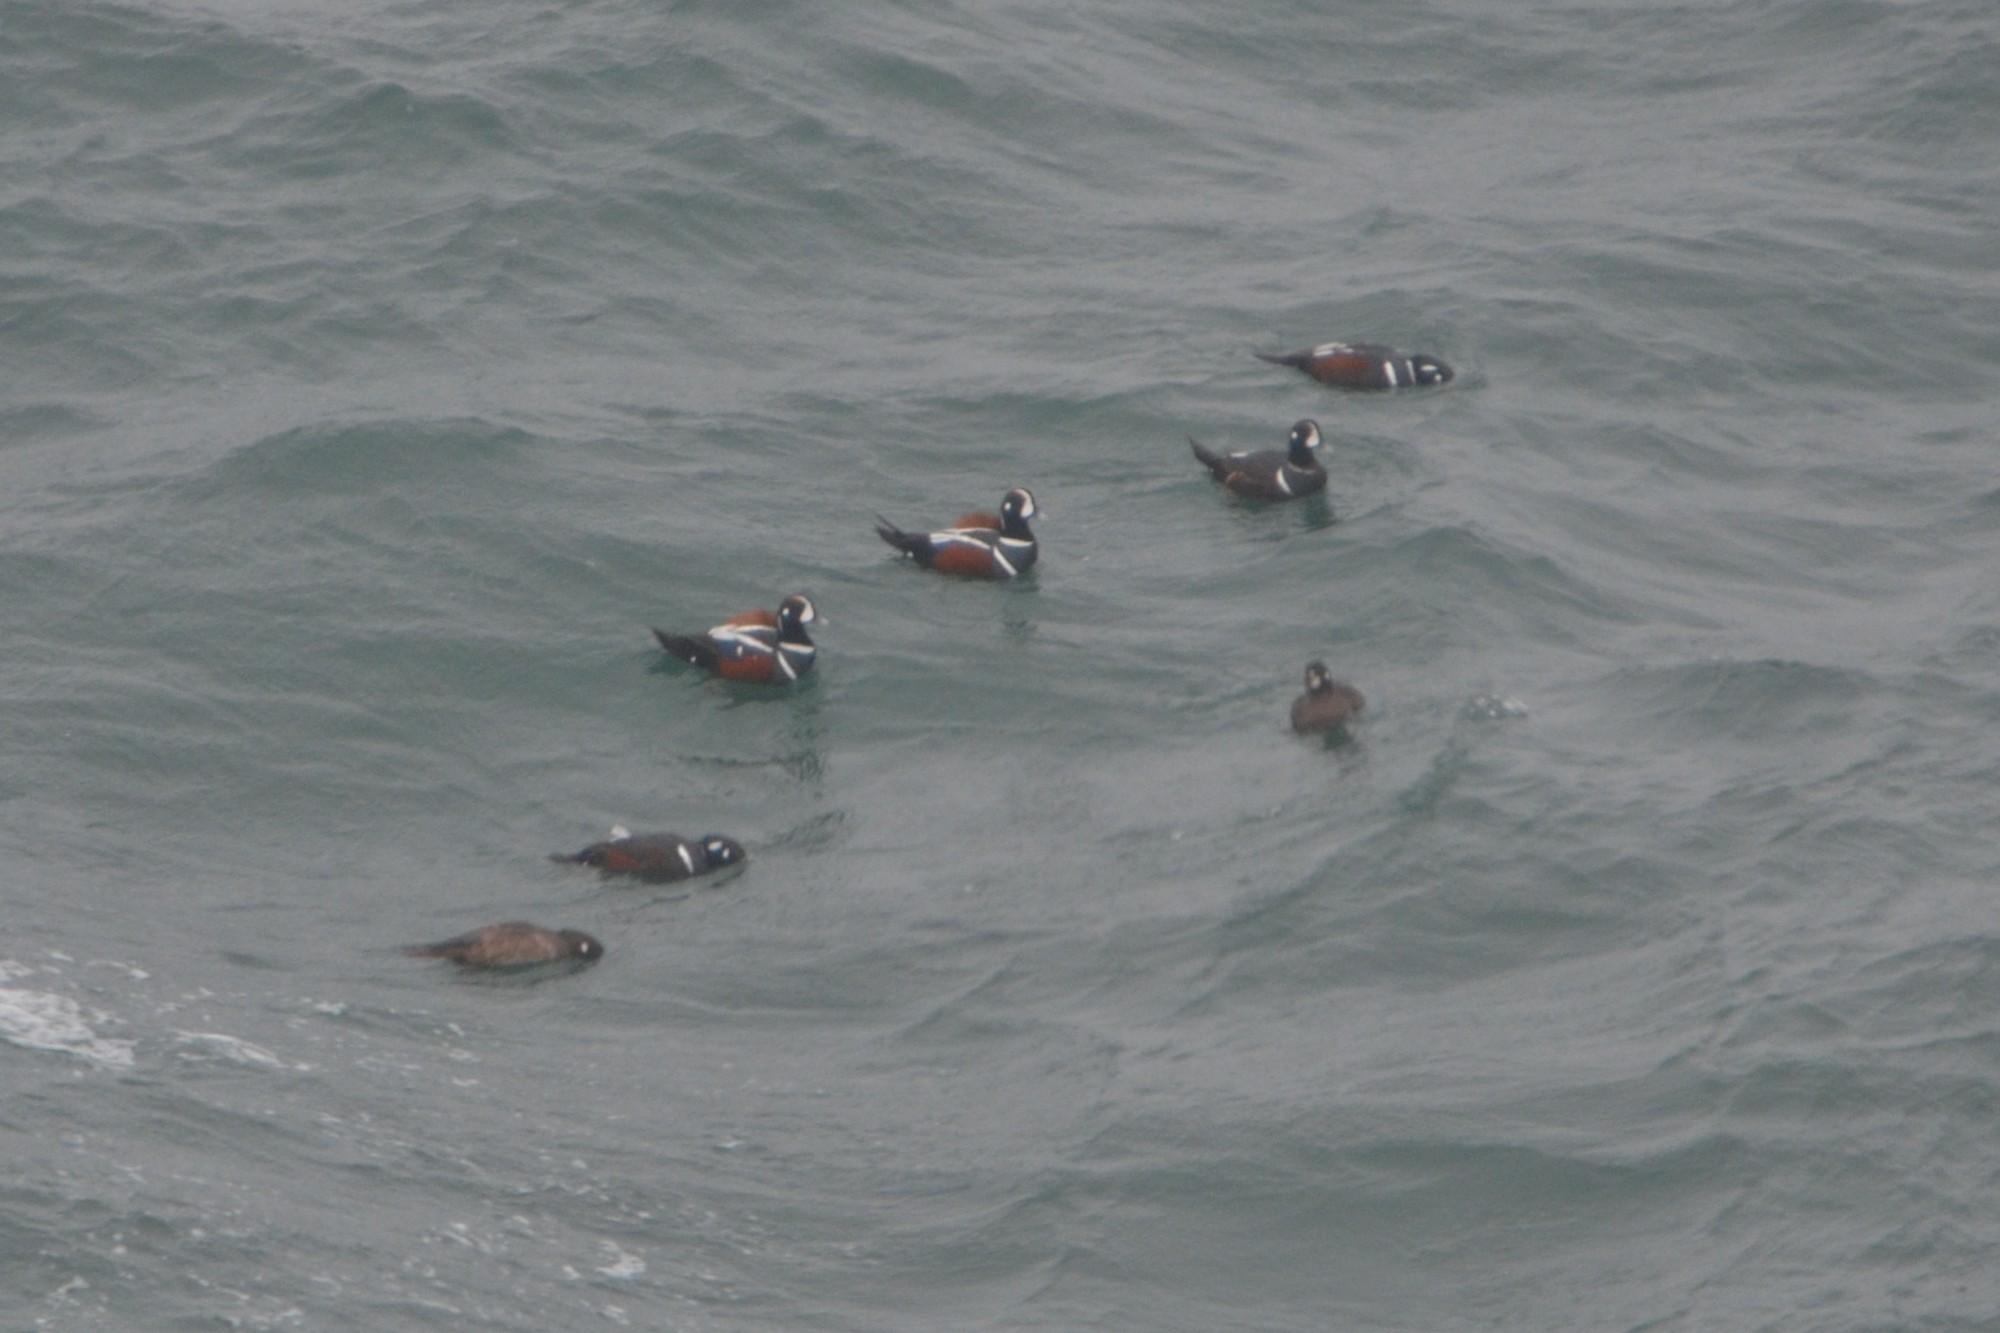 Group of harlequin ducks